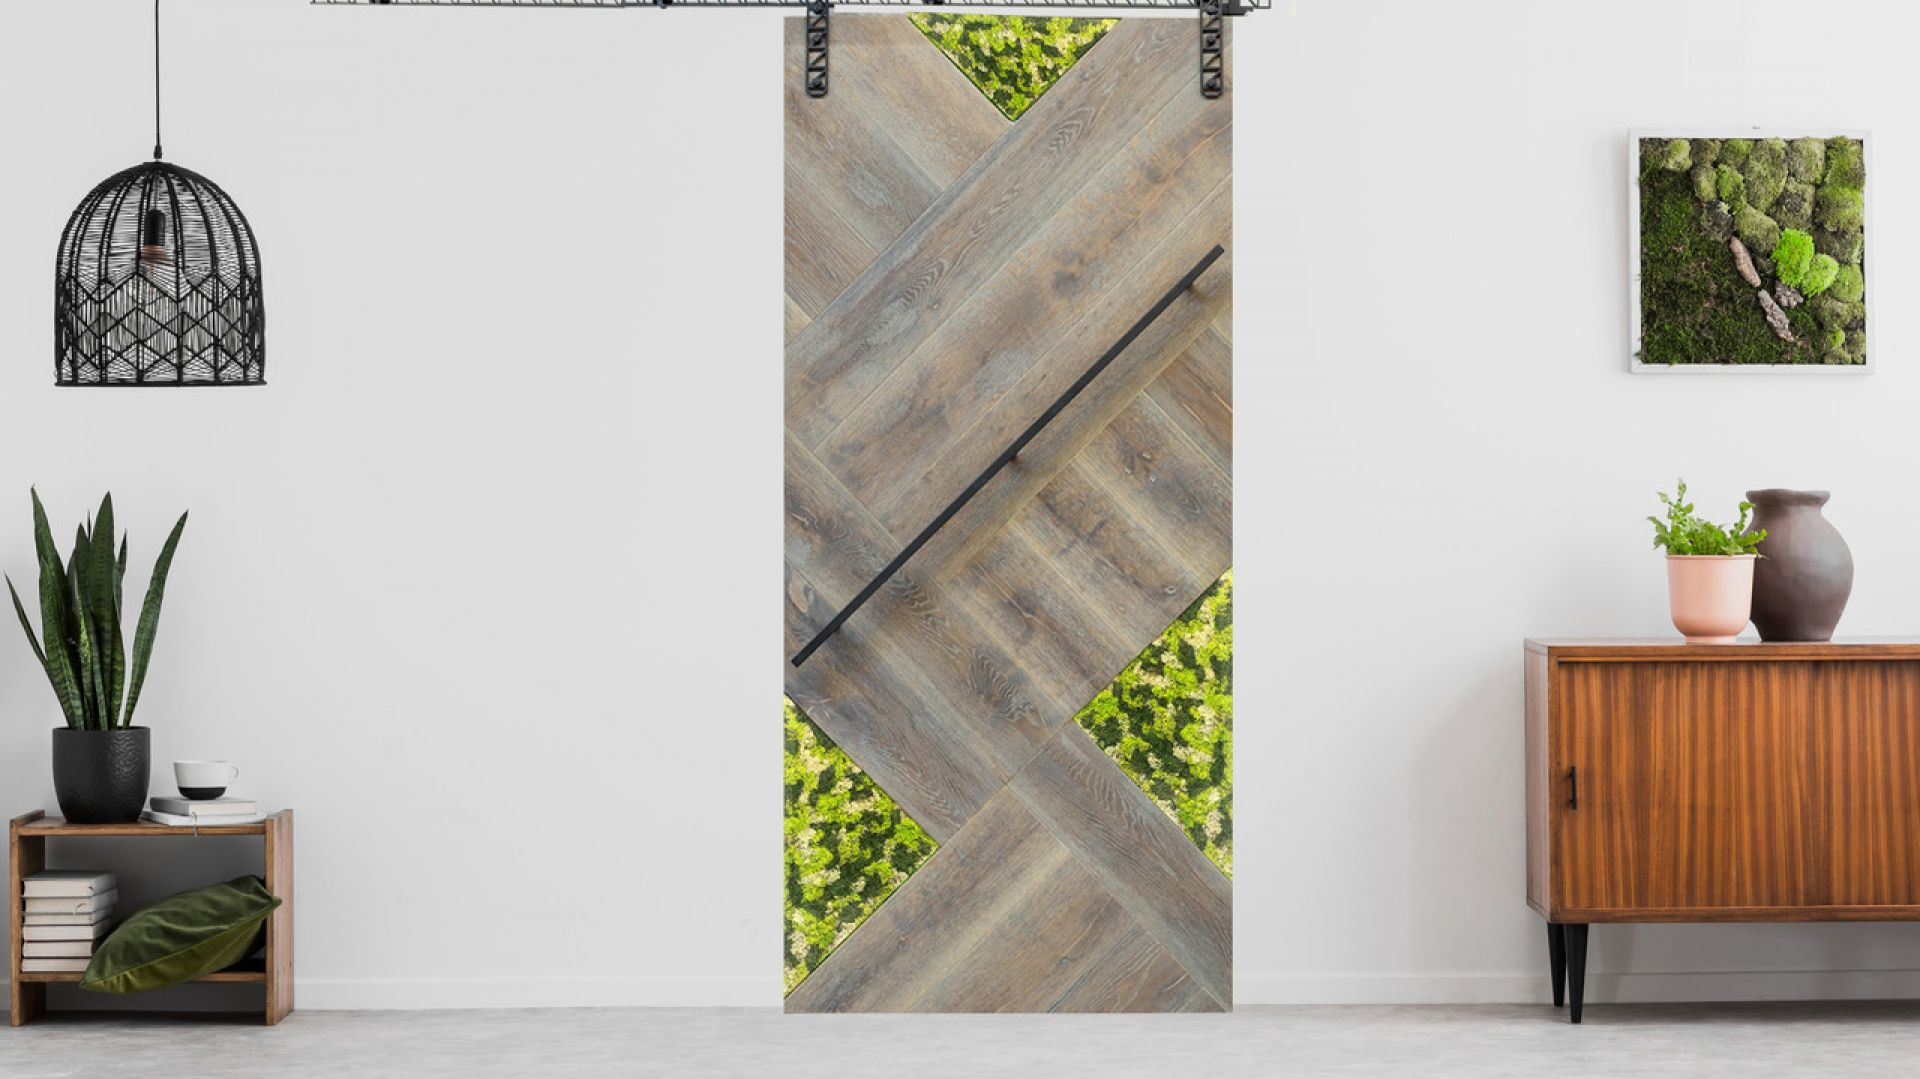 Drzwi przesuwne Nature, system Moss. Fot. Pinkstern